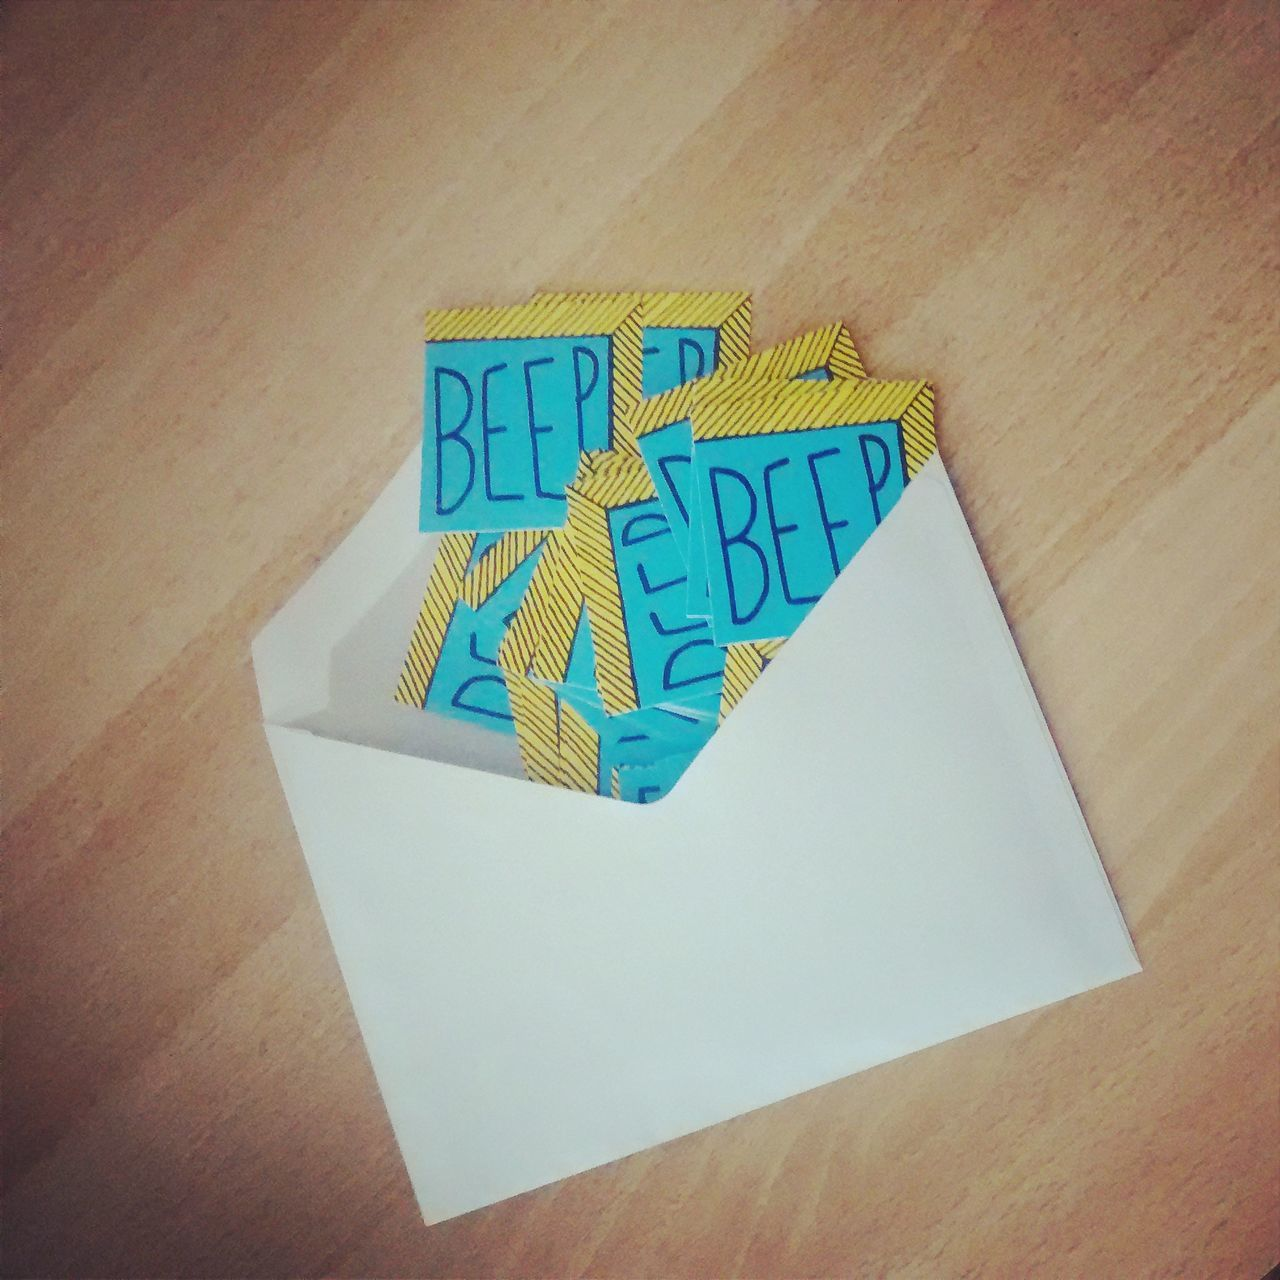 Beautiful stock photos of envelope, Art, Beep, Berlin, Communication